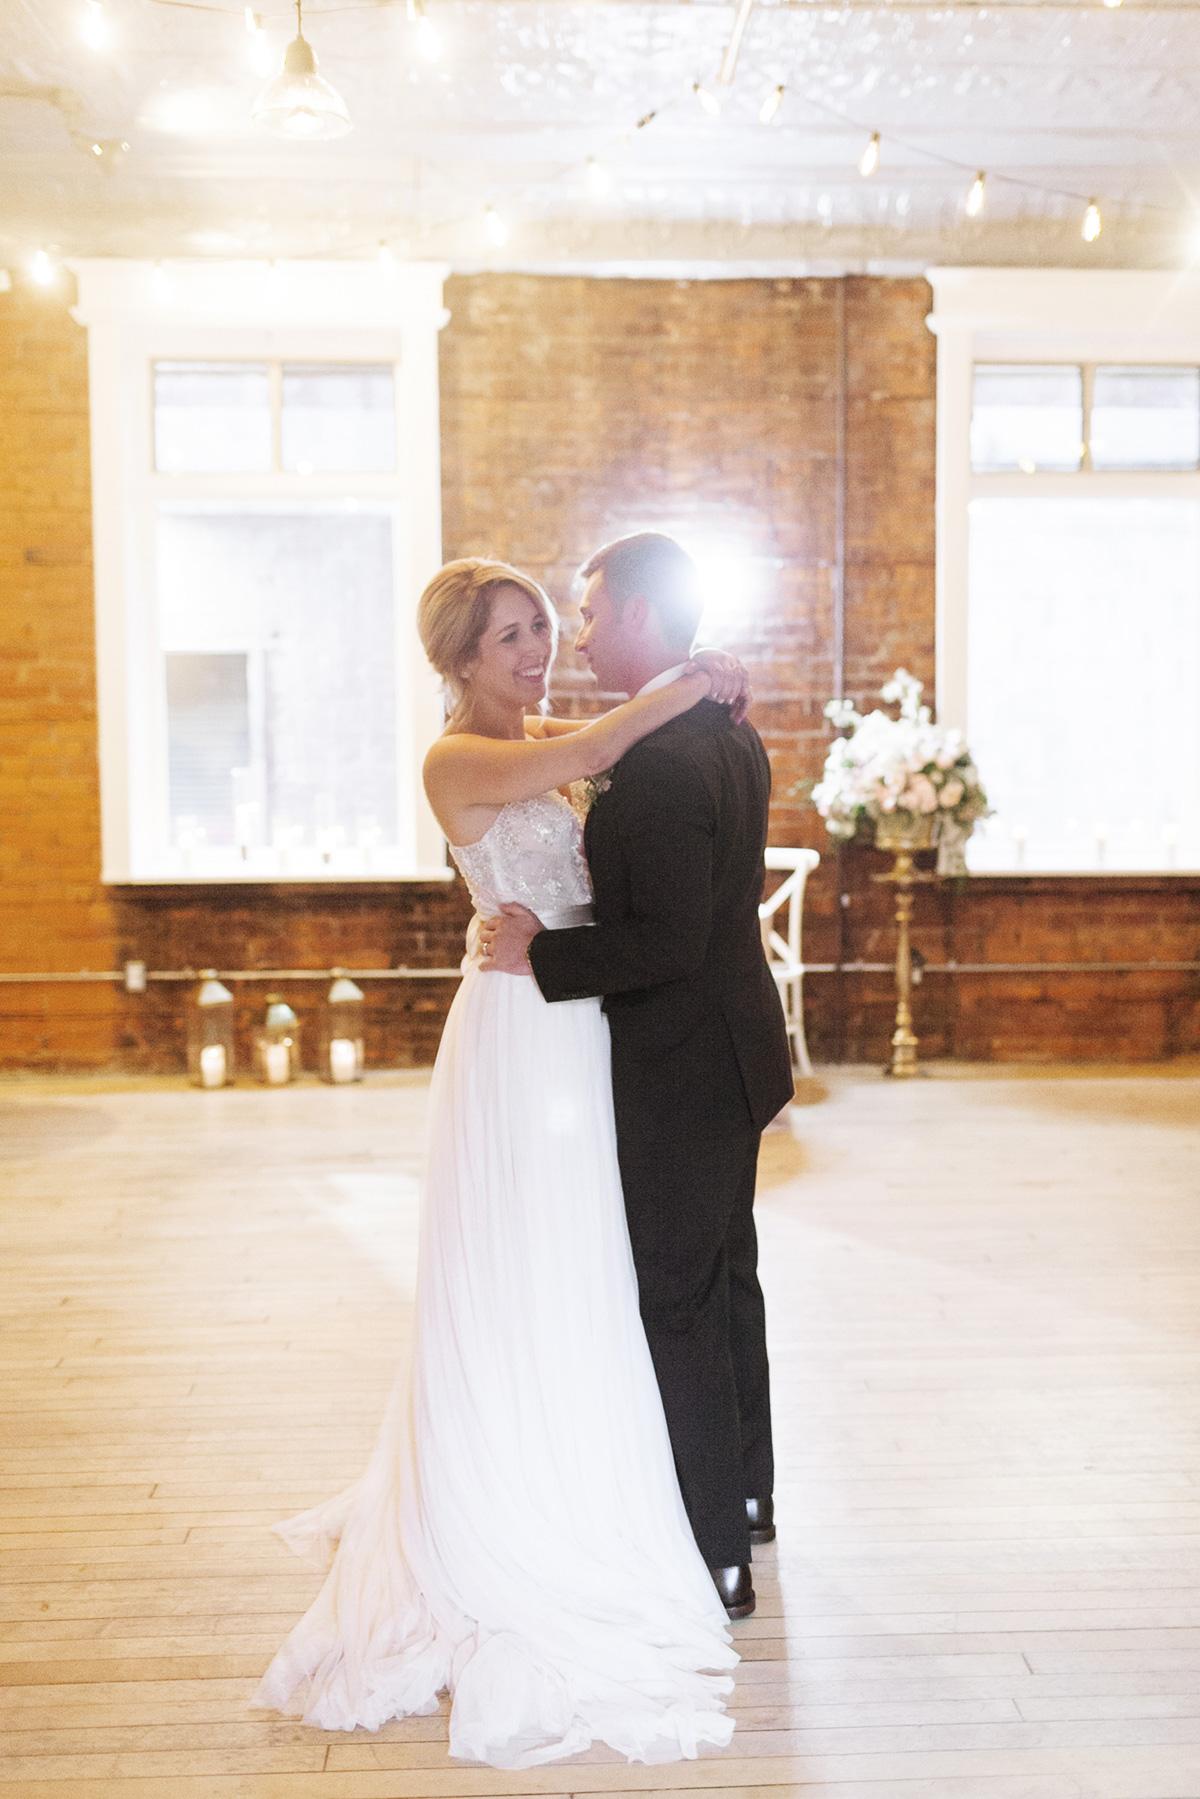 jennifer-xu-photography-vineyard-bride-swish-list-spice-factory-hamilton-wedding-49.jpg